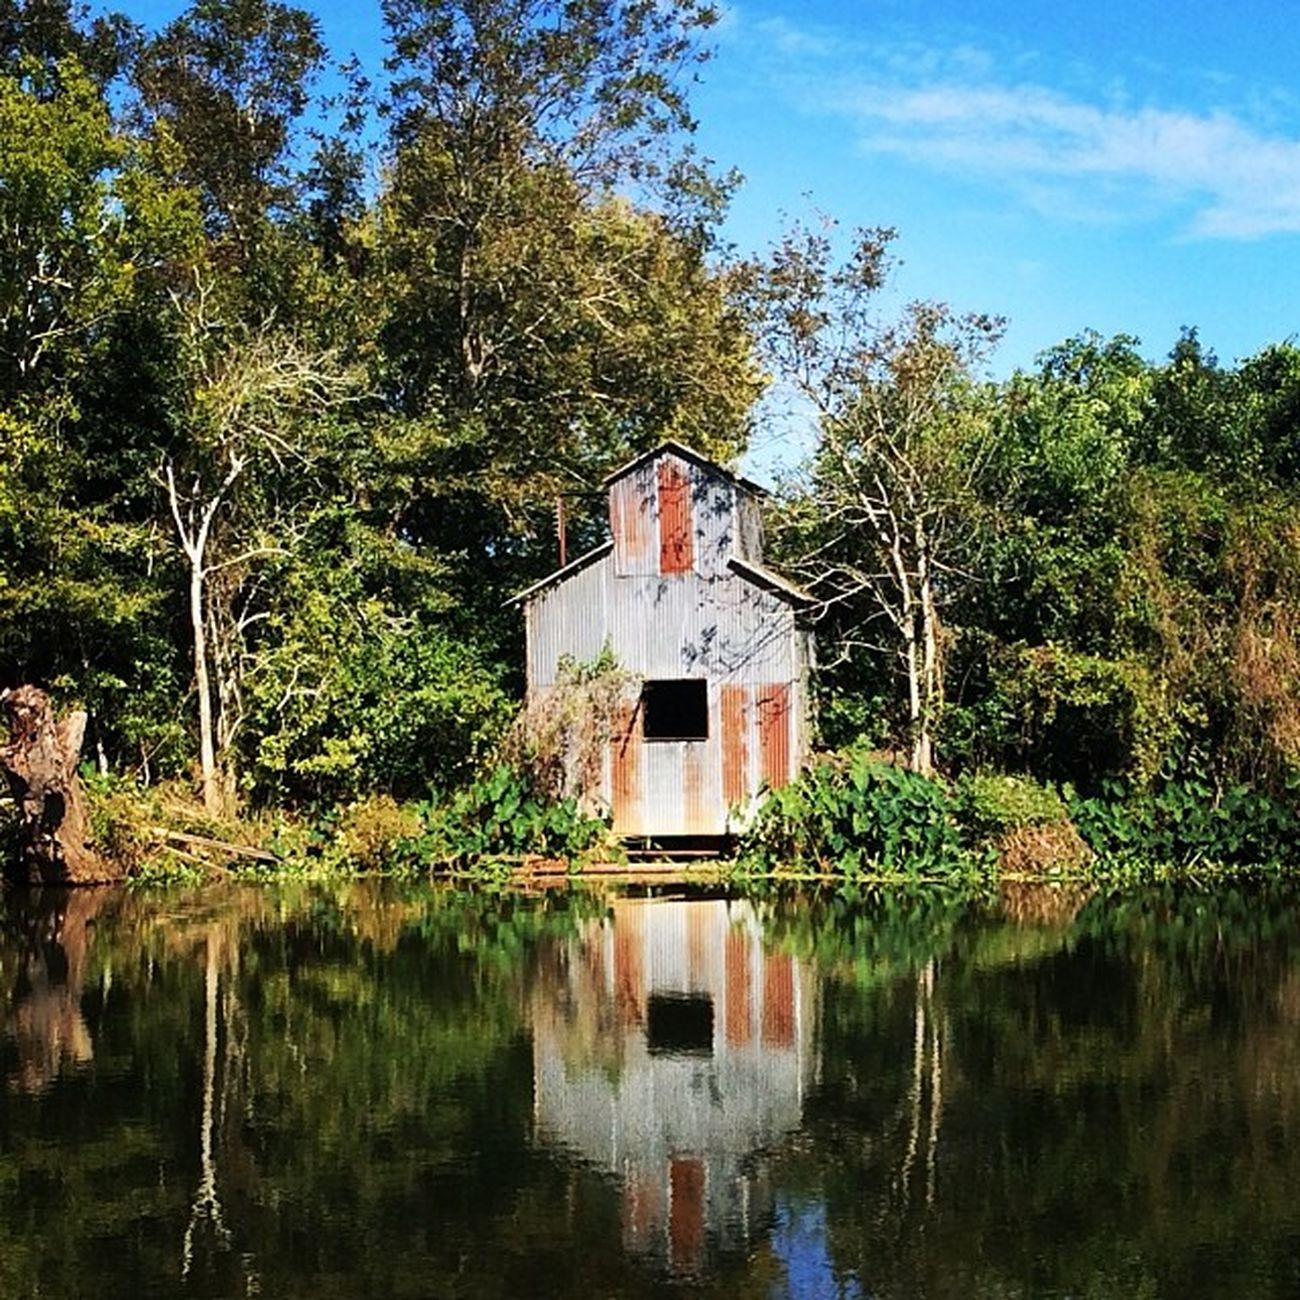 Abandoned Barn Broken Abandonedplaces Urbandecay Louisiana Bayou Bluesky Urbanexploring Trailblazers_rurex Trb_members1 OutcastAmerica Abandonedamerica Onlylouisiana Louisianatravel Abandonedlouisiana Trb_love_shack_baby